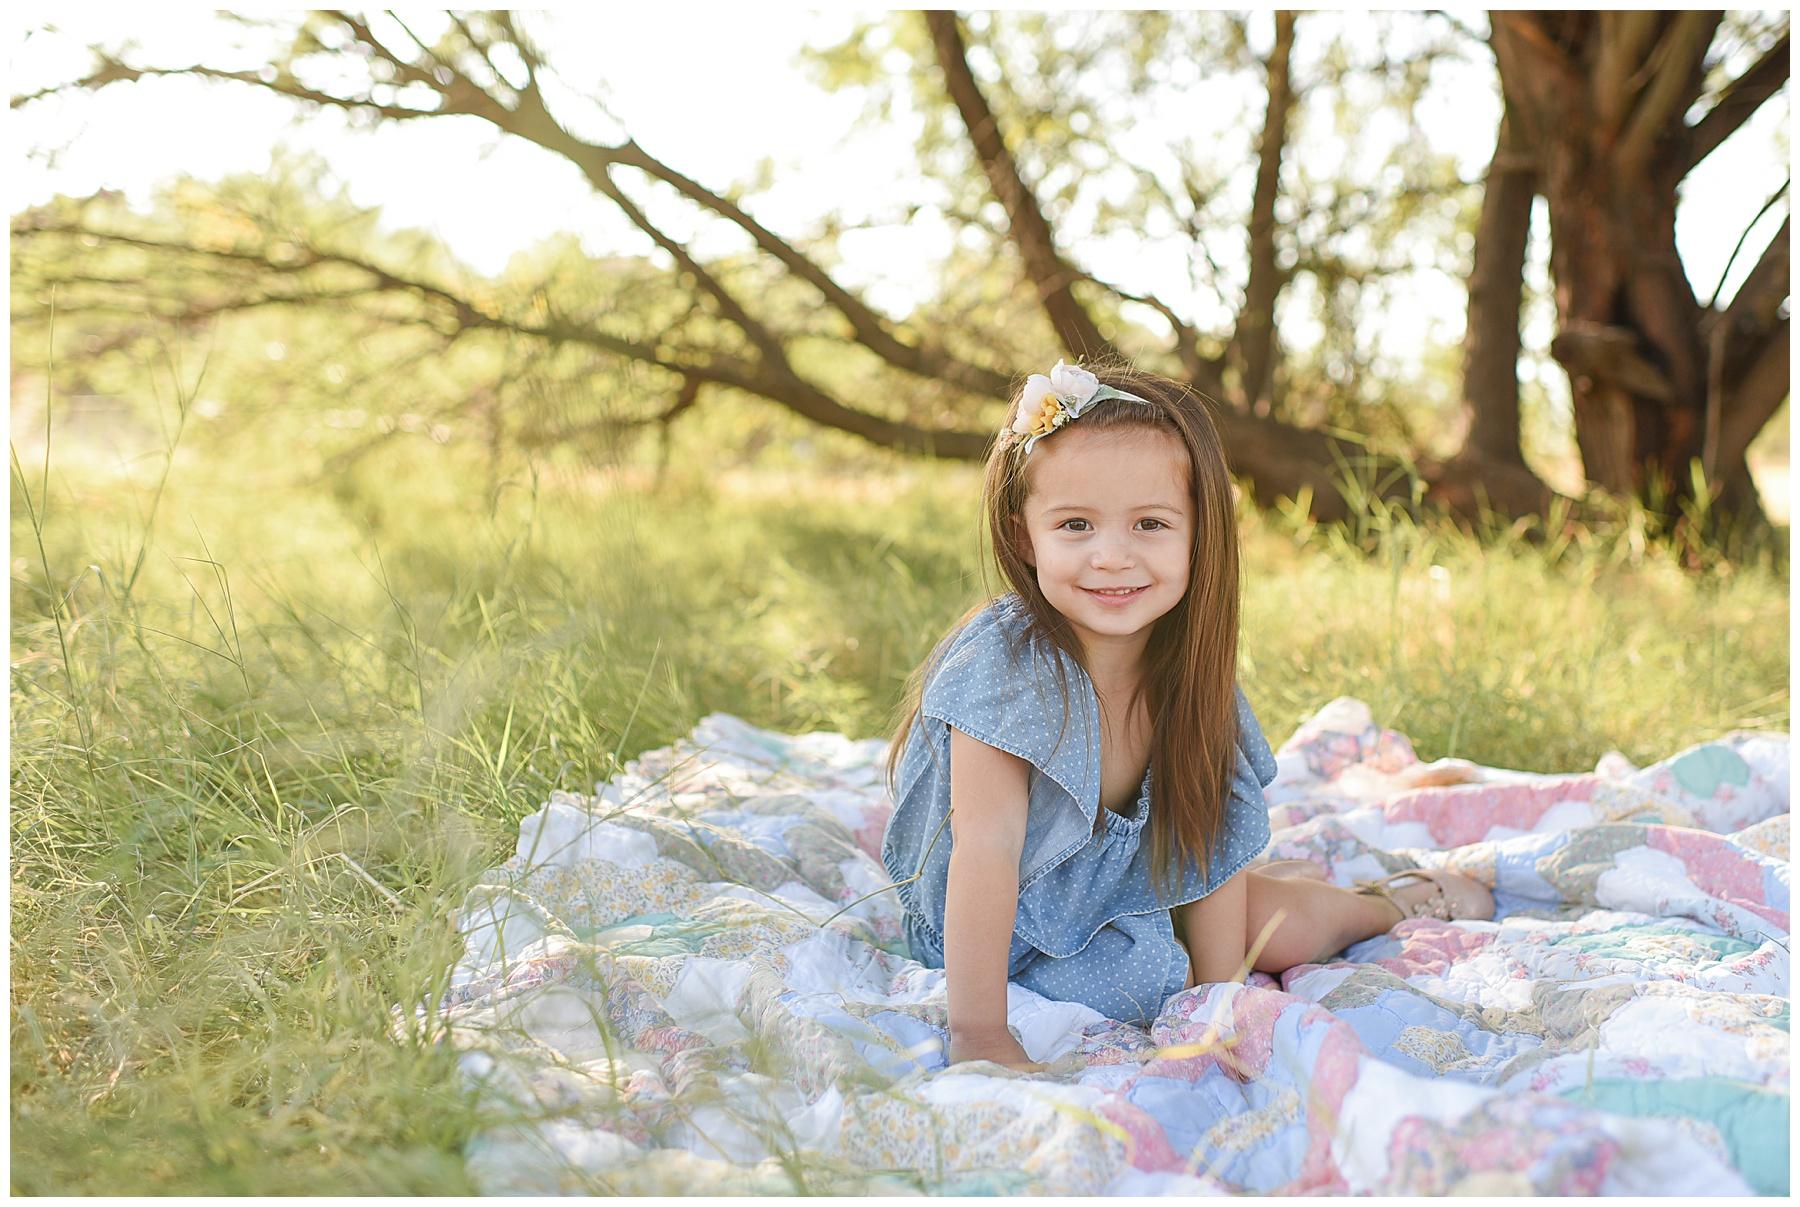 Phoenix Child Portrait Photographer | SweetLife Photography